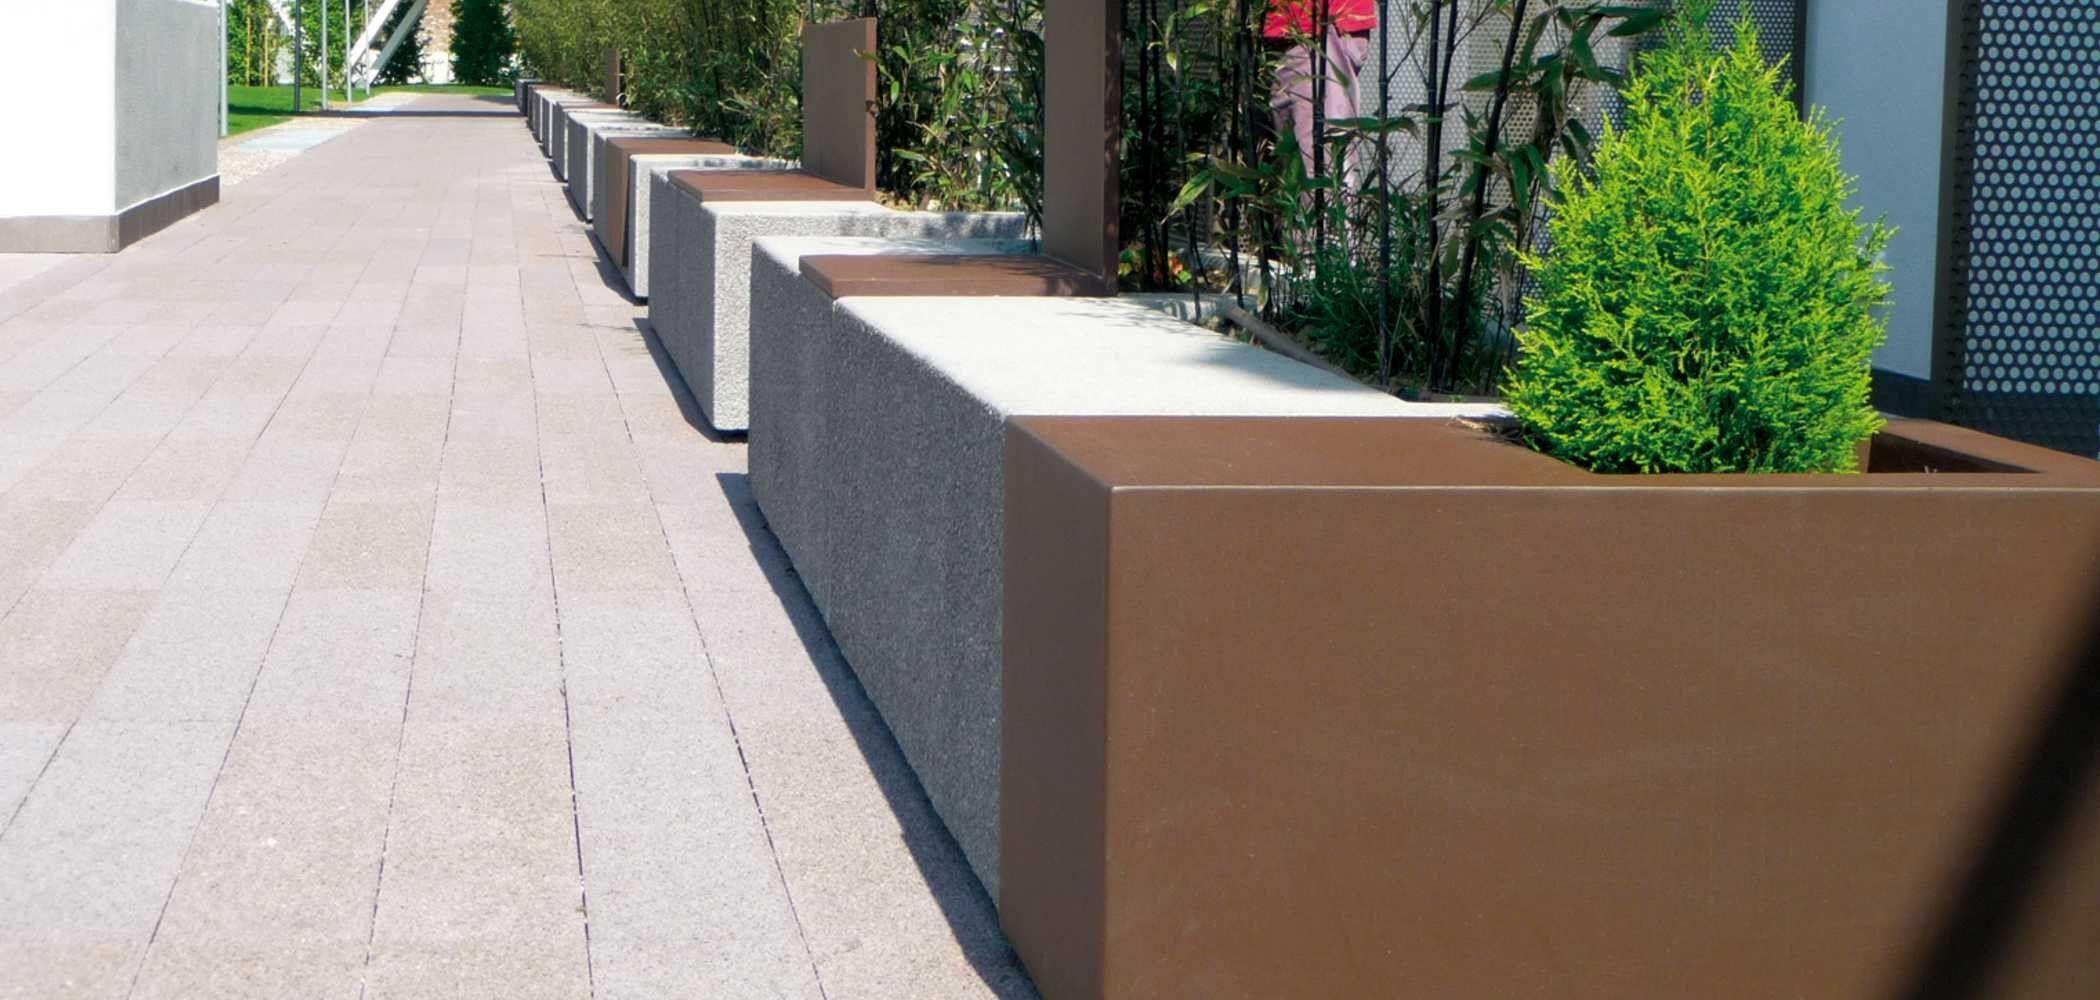 Panchina modulare con fioriera integrata mamu metalco for Panchine arredo urbano prezzi